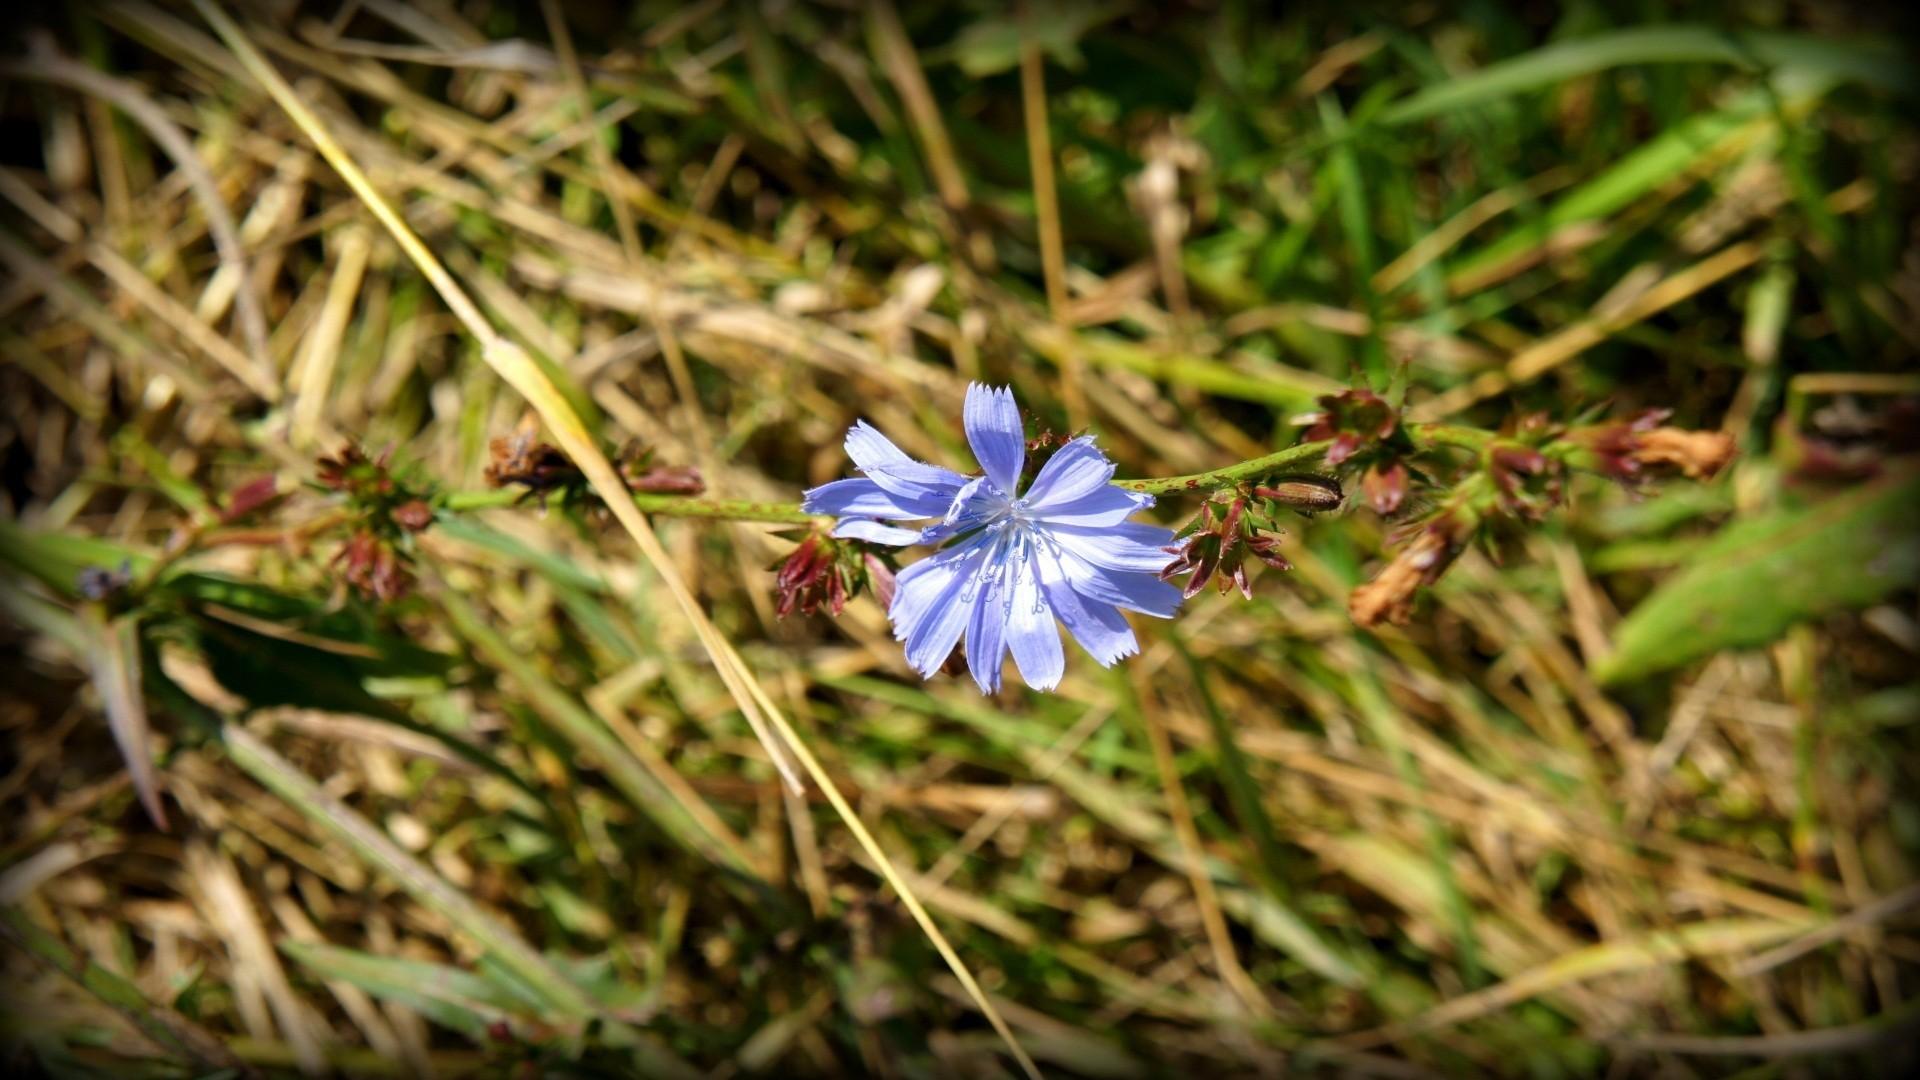 Wallpaper : garden, nature, green, blue flowers, vignette, herb ...